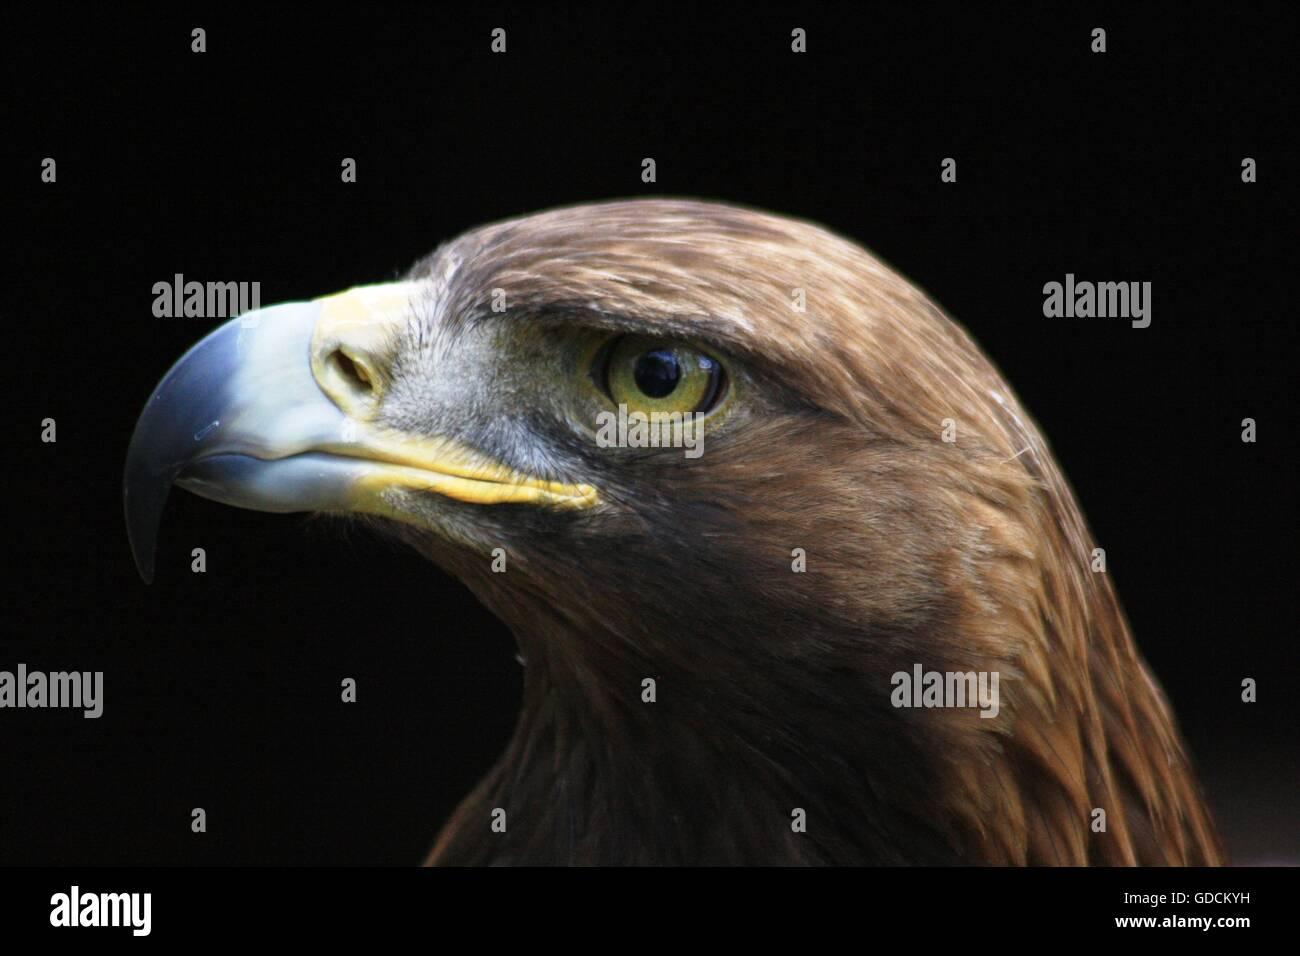 Golden Eagle portrait taken at Andover Hawk Conservancy - Stock Image